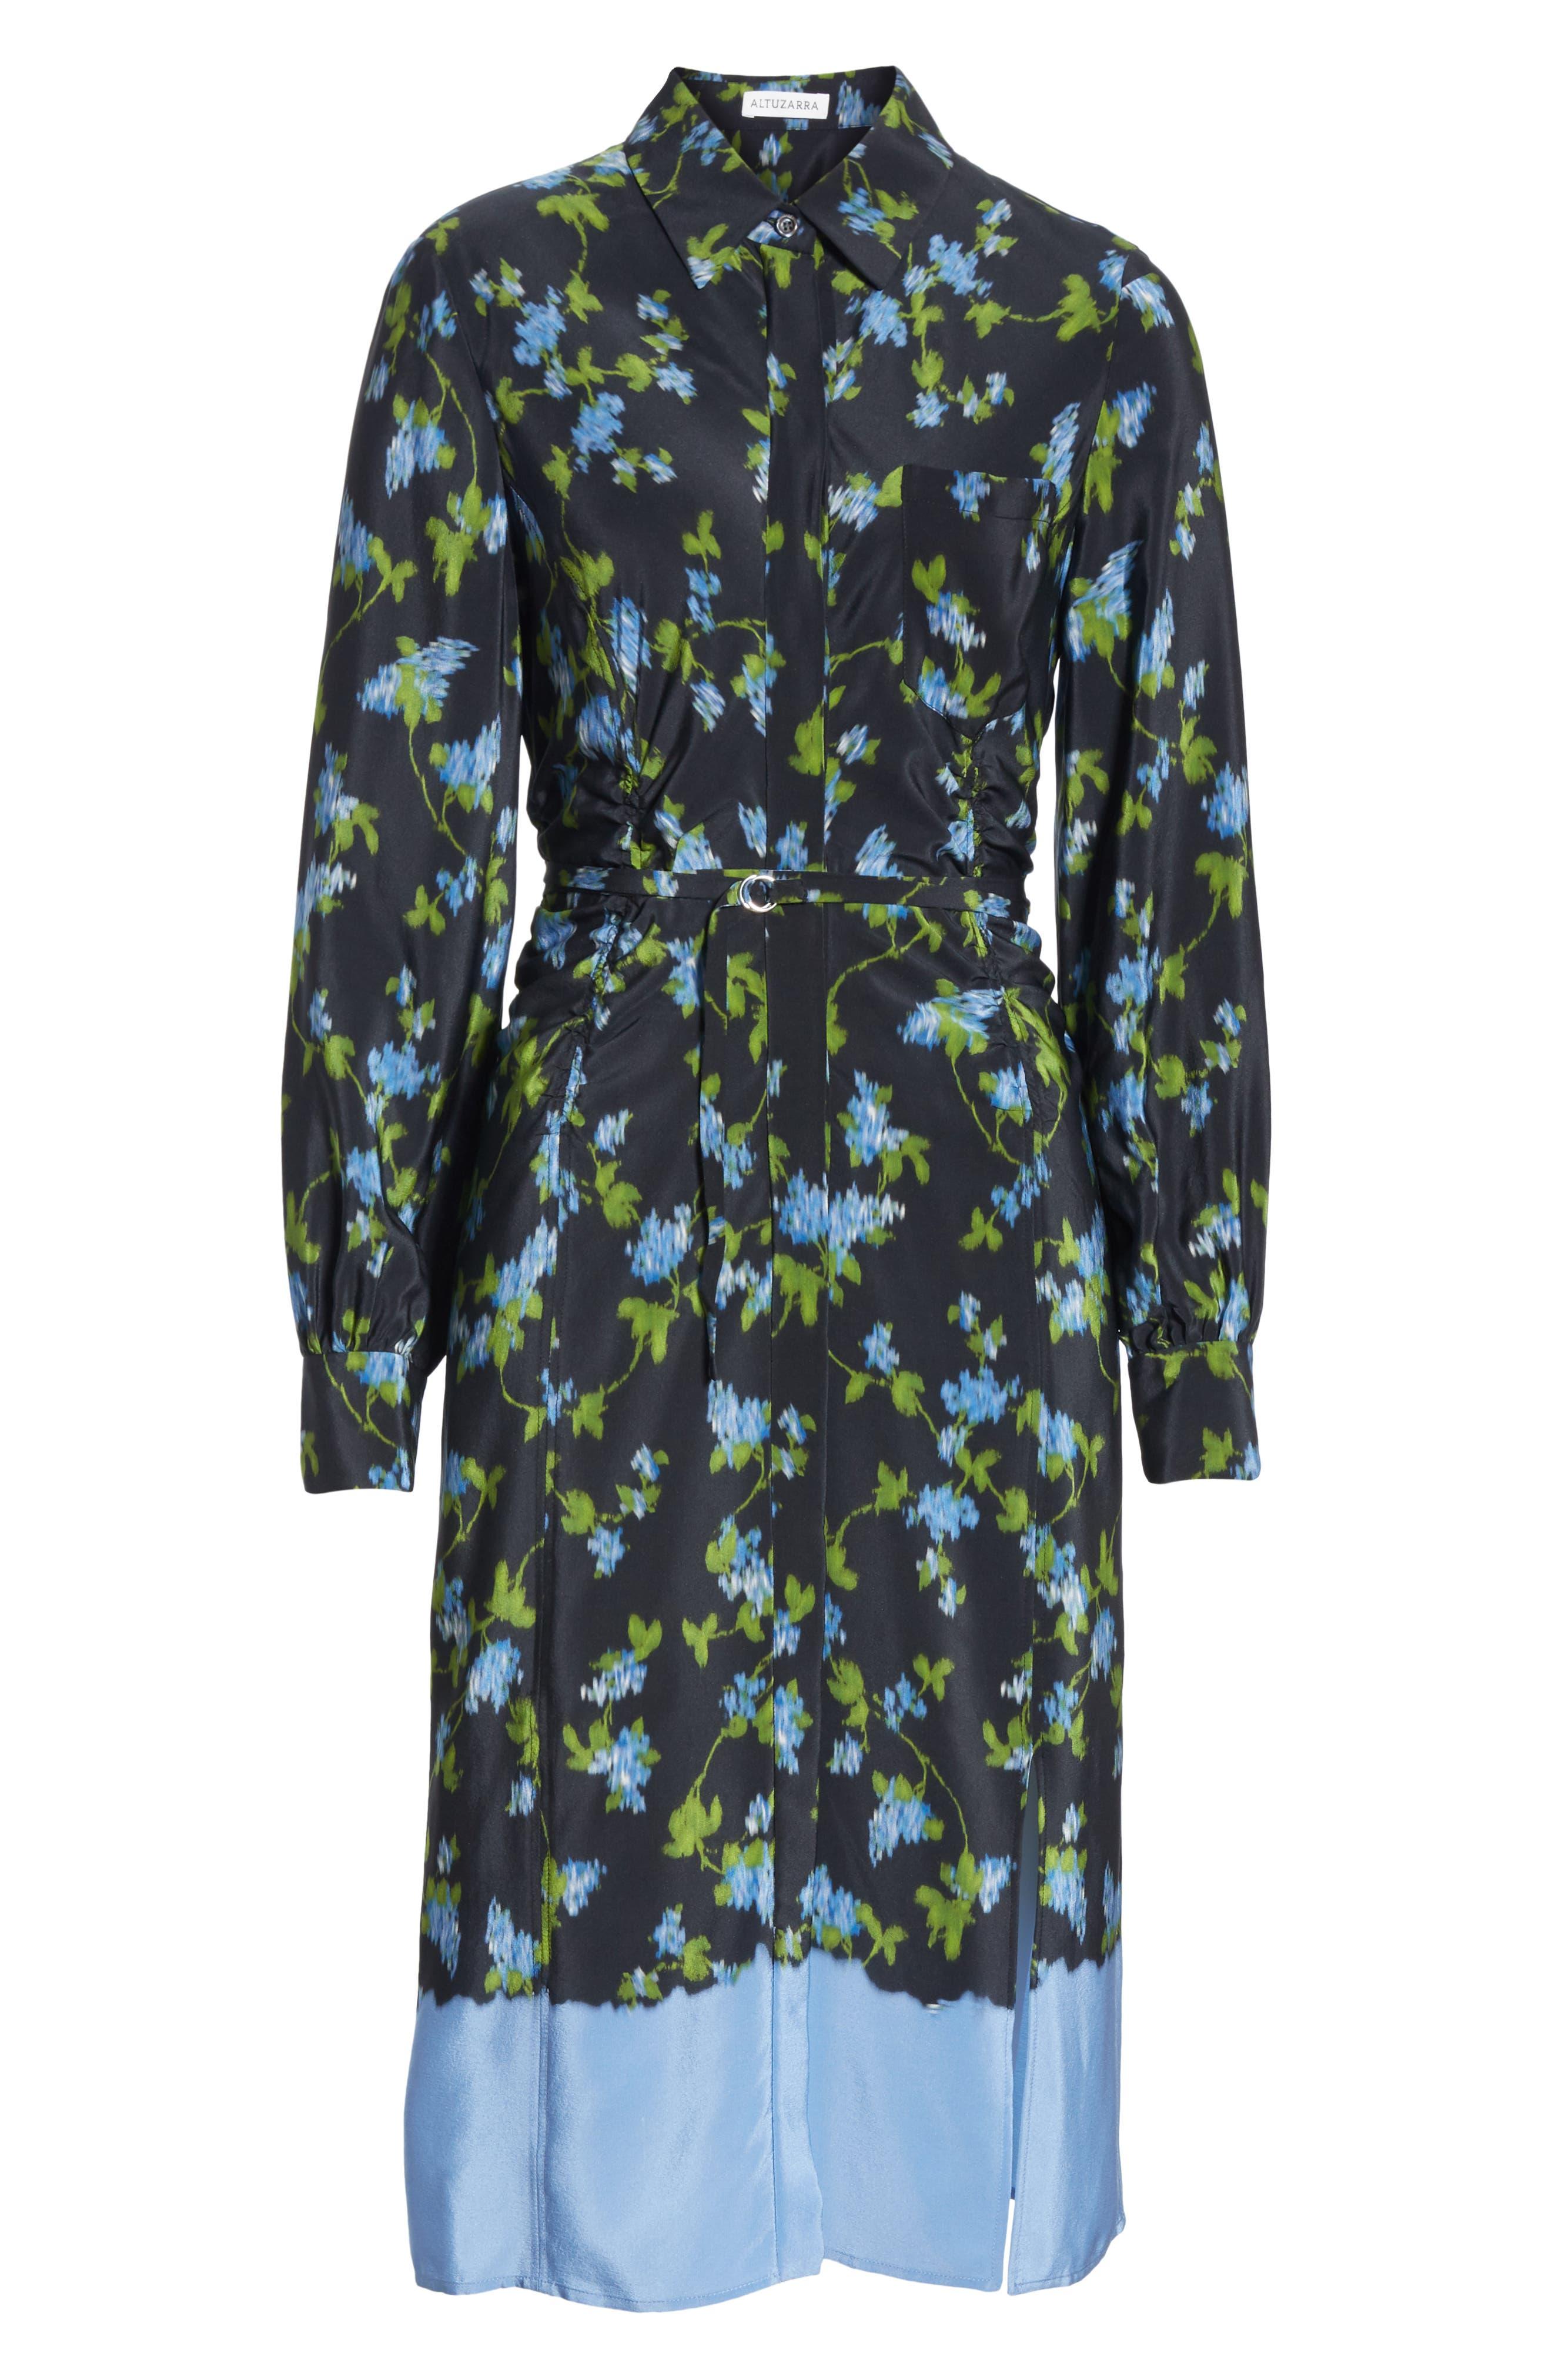 ALTUZARRA, Floral Print Silk Dress, Alternate thumbnail 7, color, BLACK